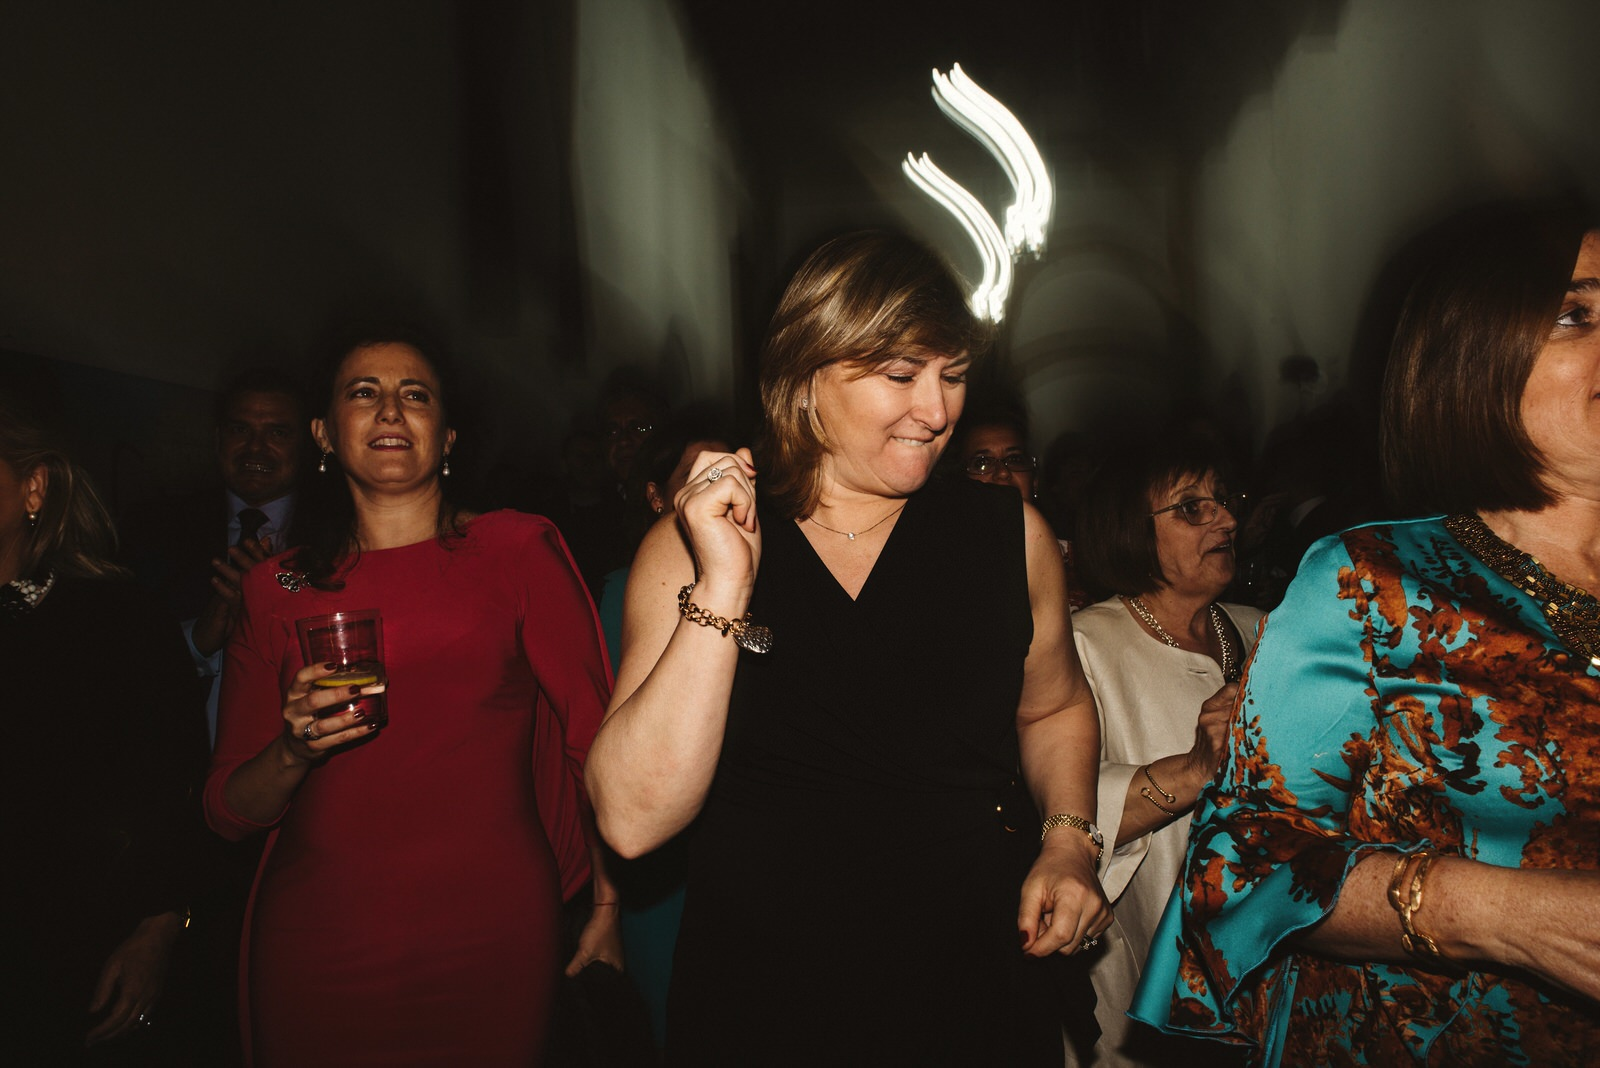 fotografo de bodas sevilla - fotografo boda - fotografía sevilla - Andrés AmarilloAAA_3793- fine.JPG